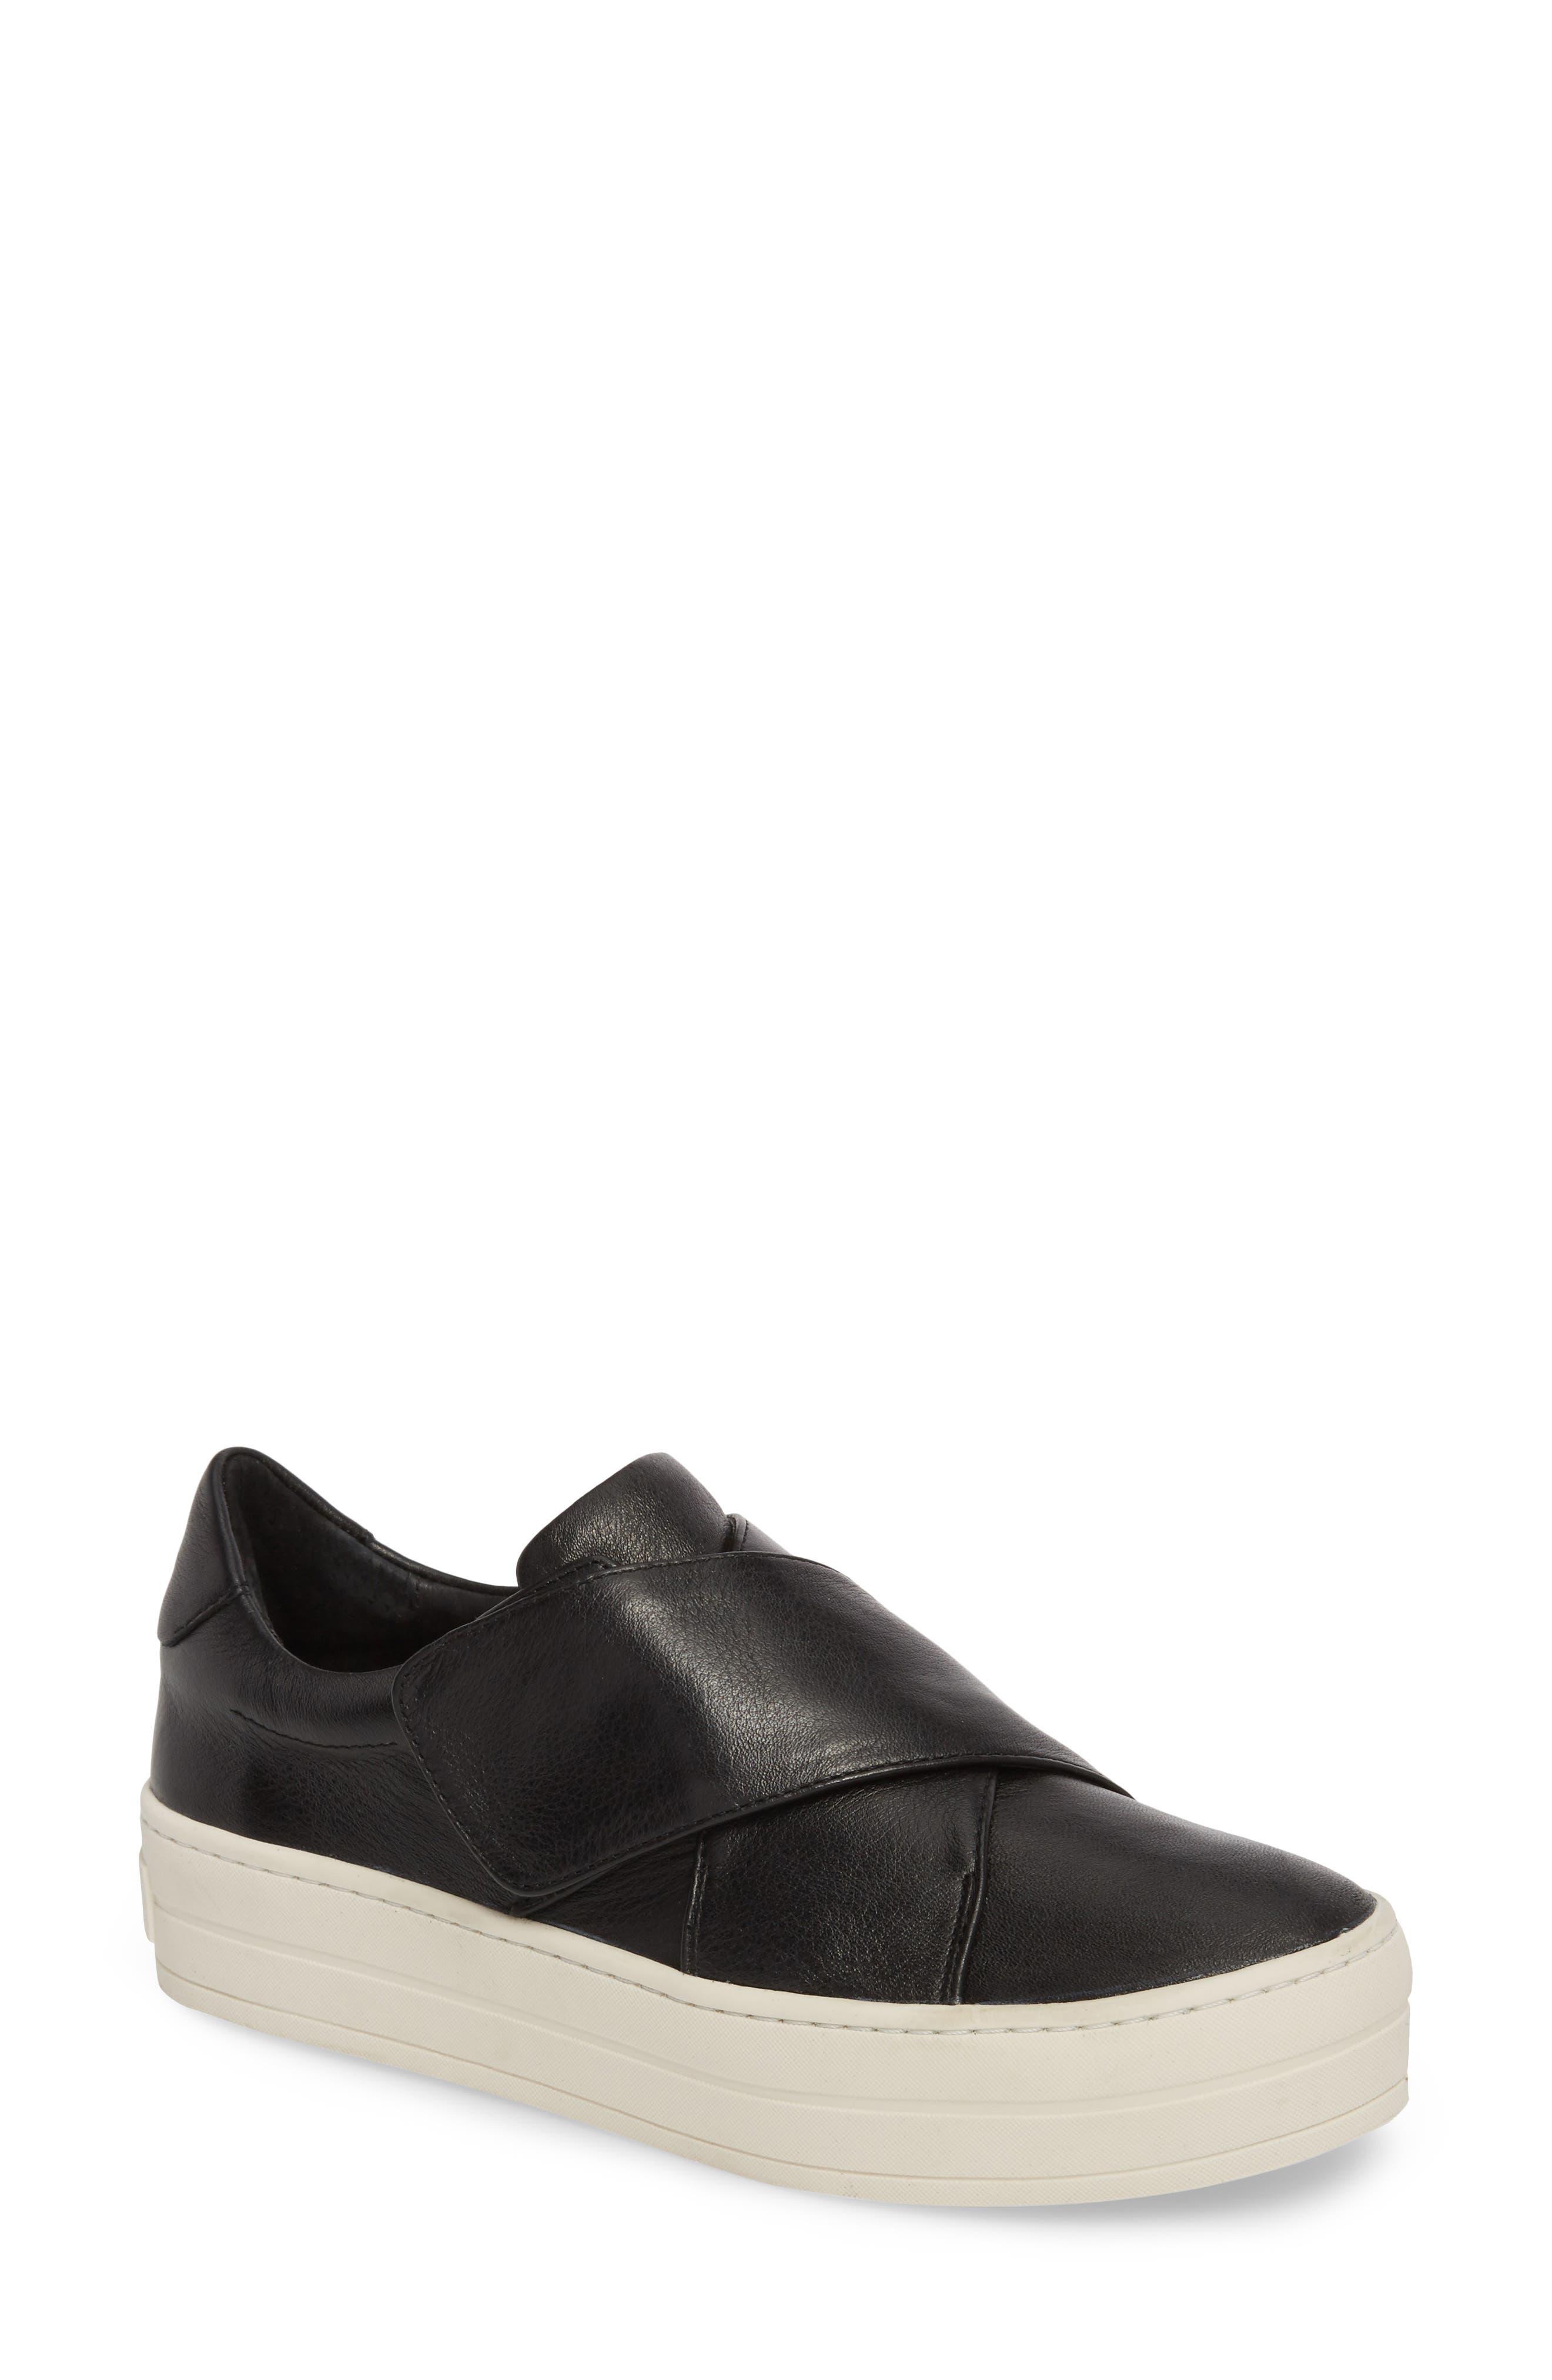 Harper Sneaker,                         Main,                         color, Black Leather